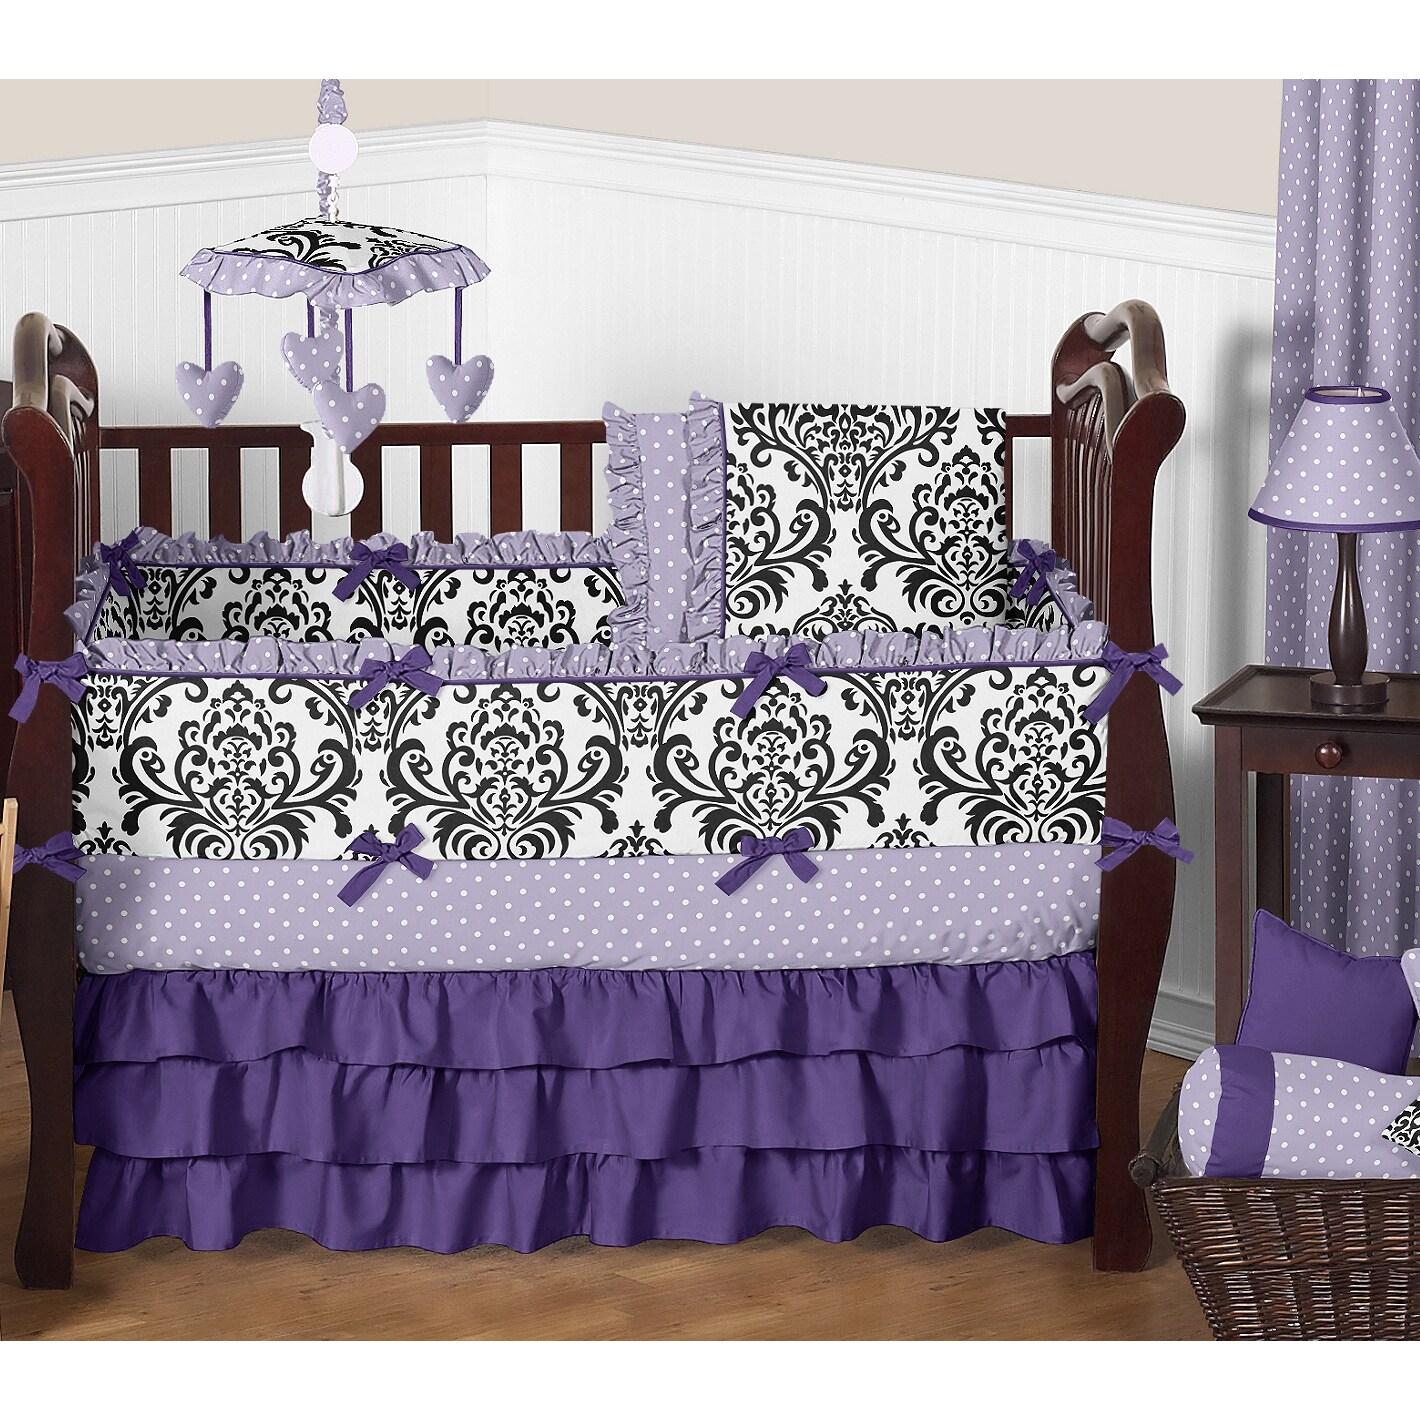 JoJo Designs 9-piece Crib Bedding Set for the Sloane Coll...